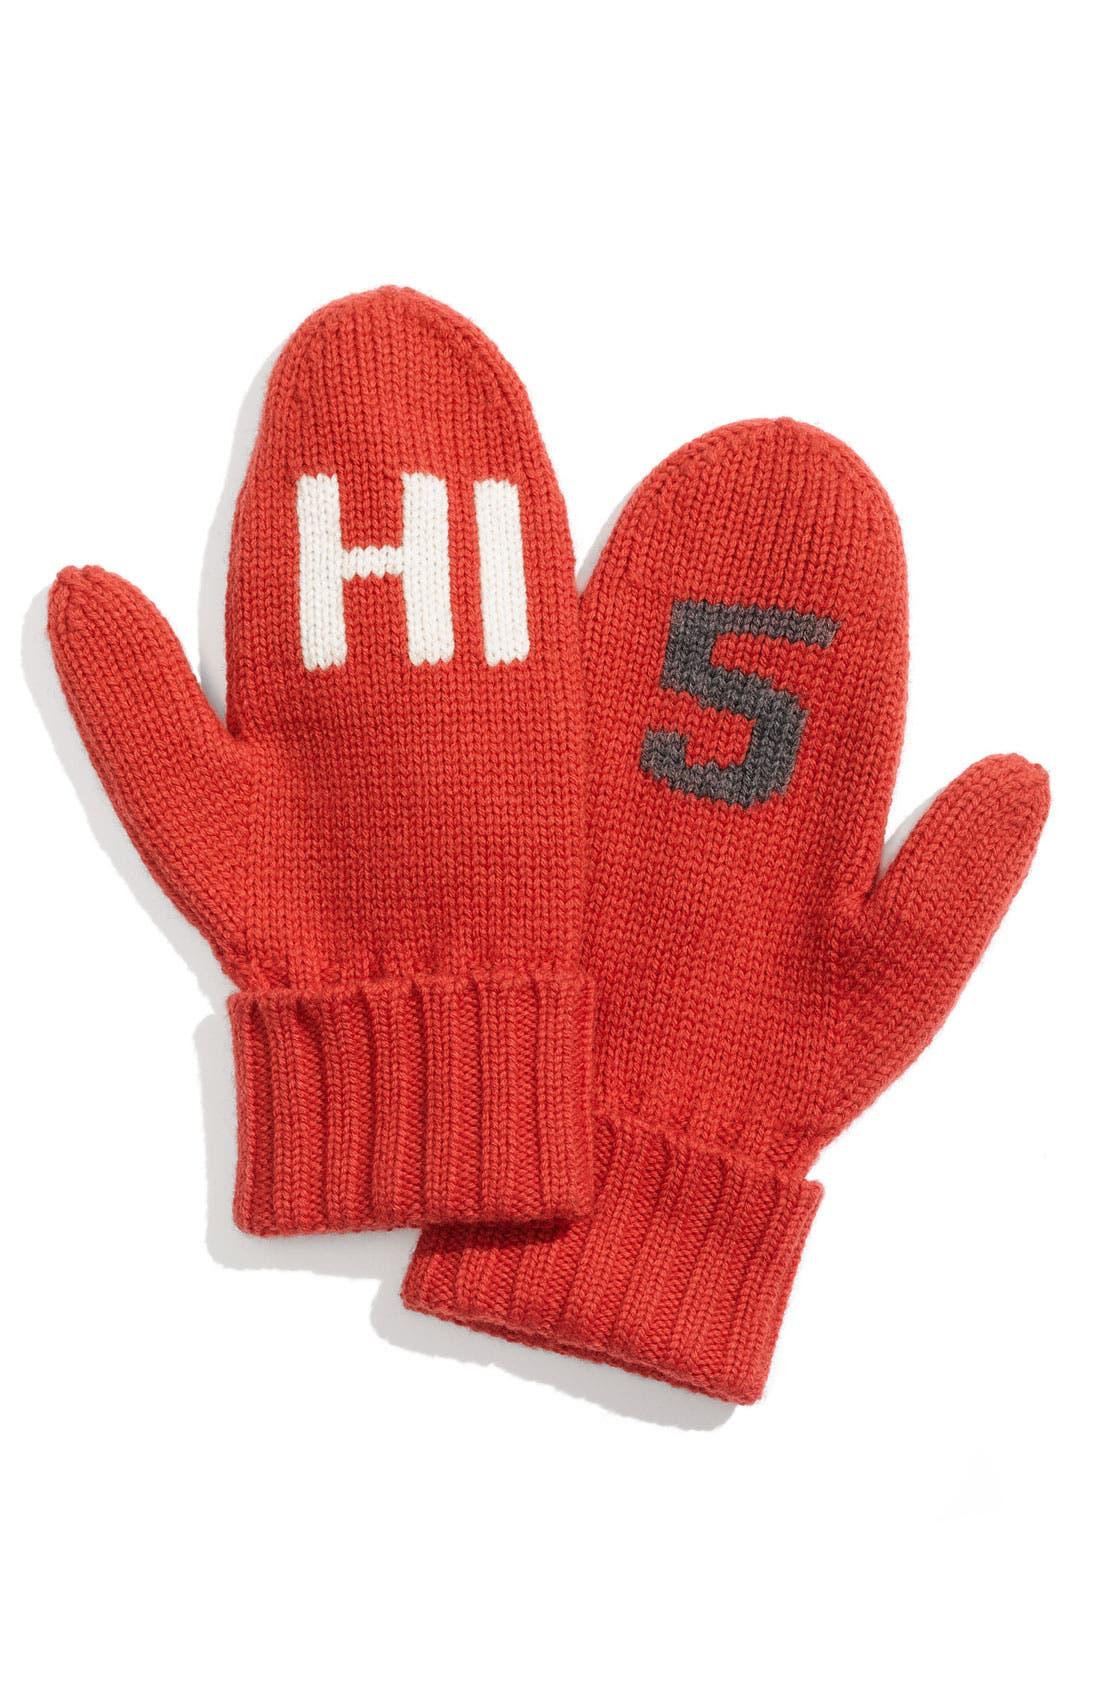 Main Image - kate spade new york 'hi 5' mittens